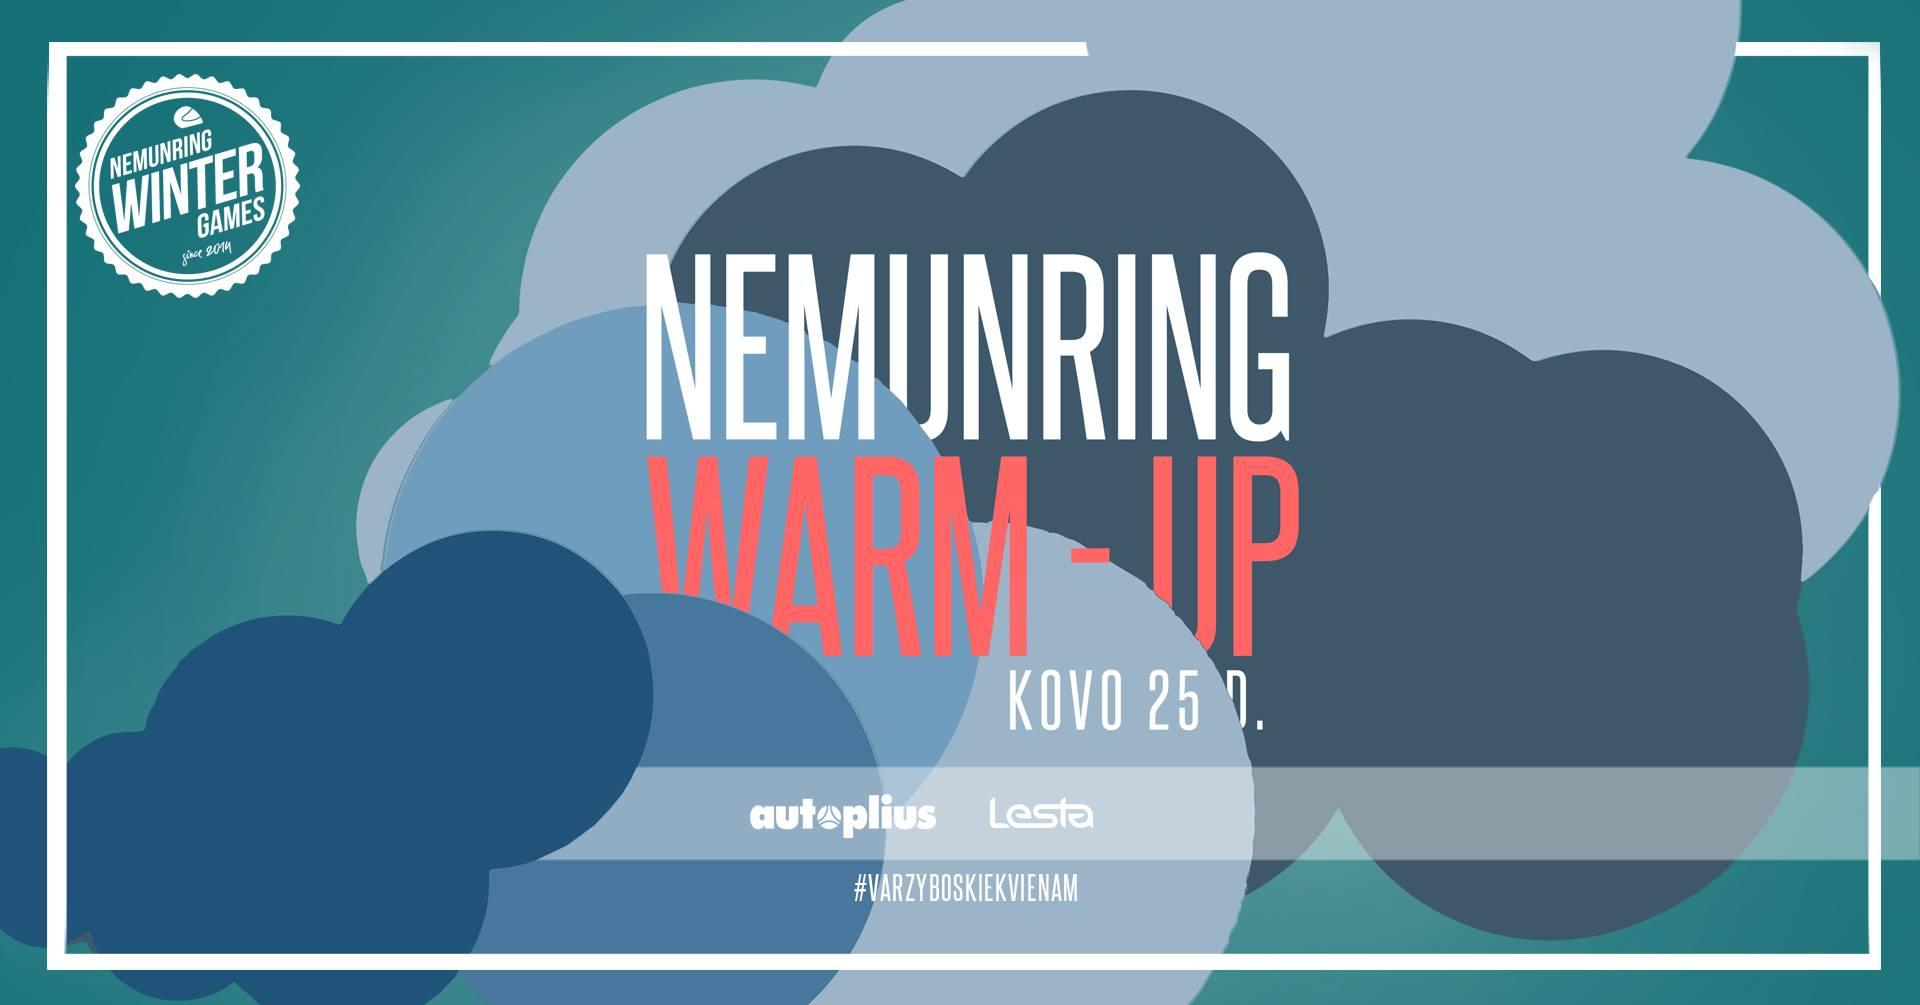 Nemunring WARM-Up